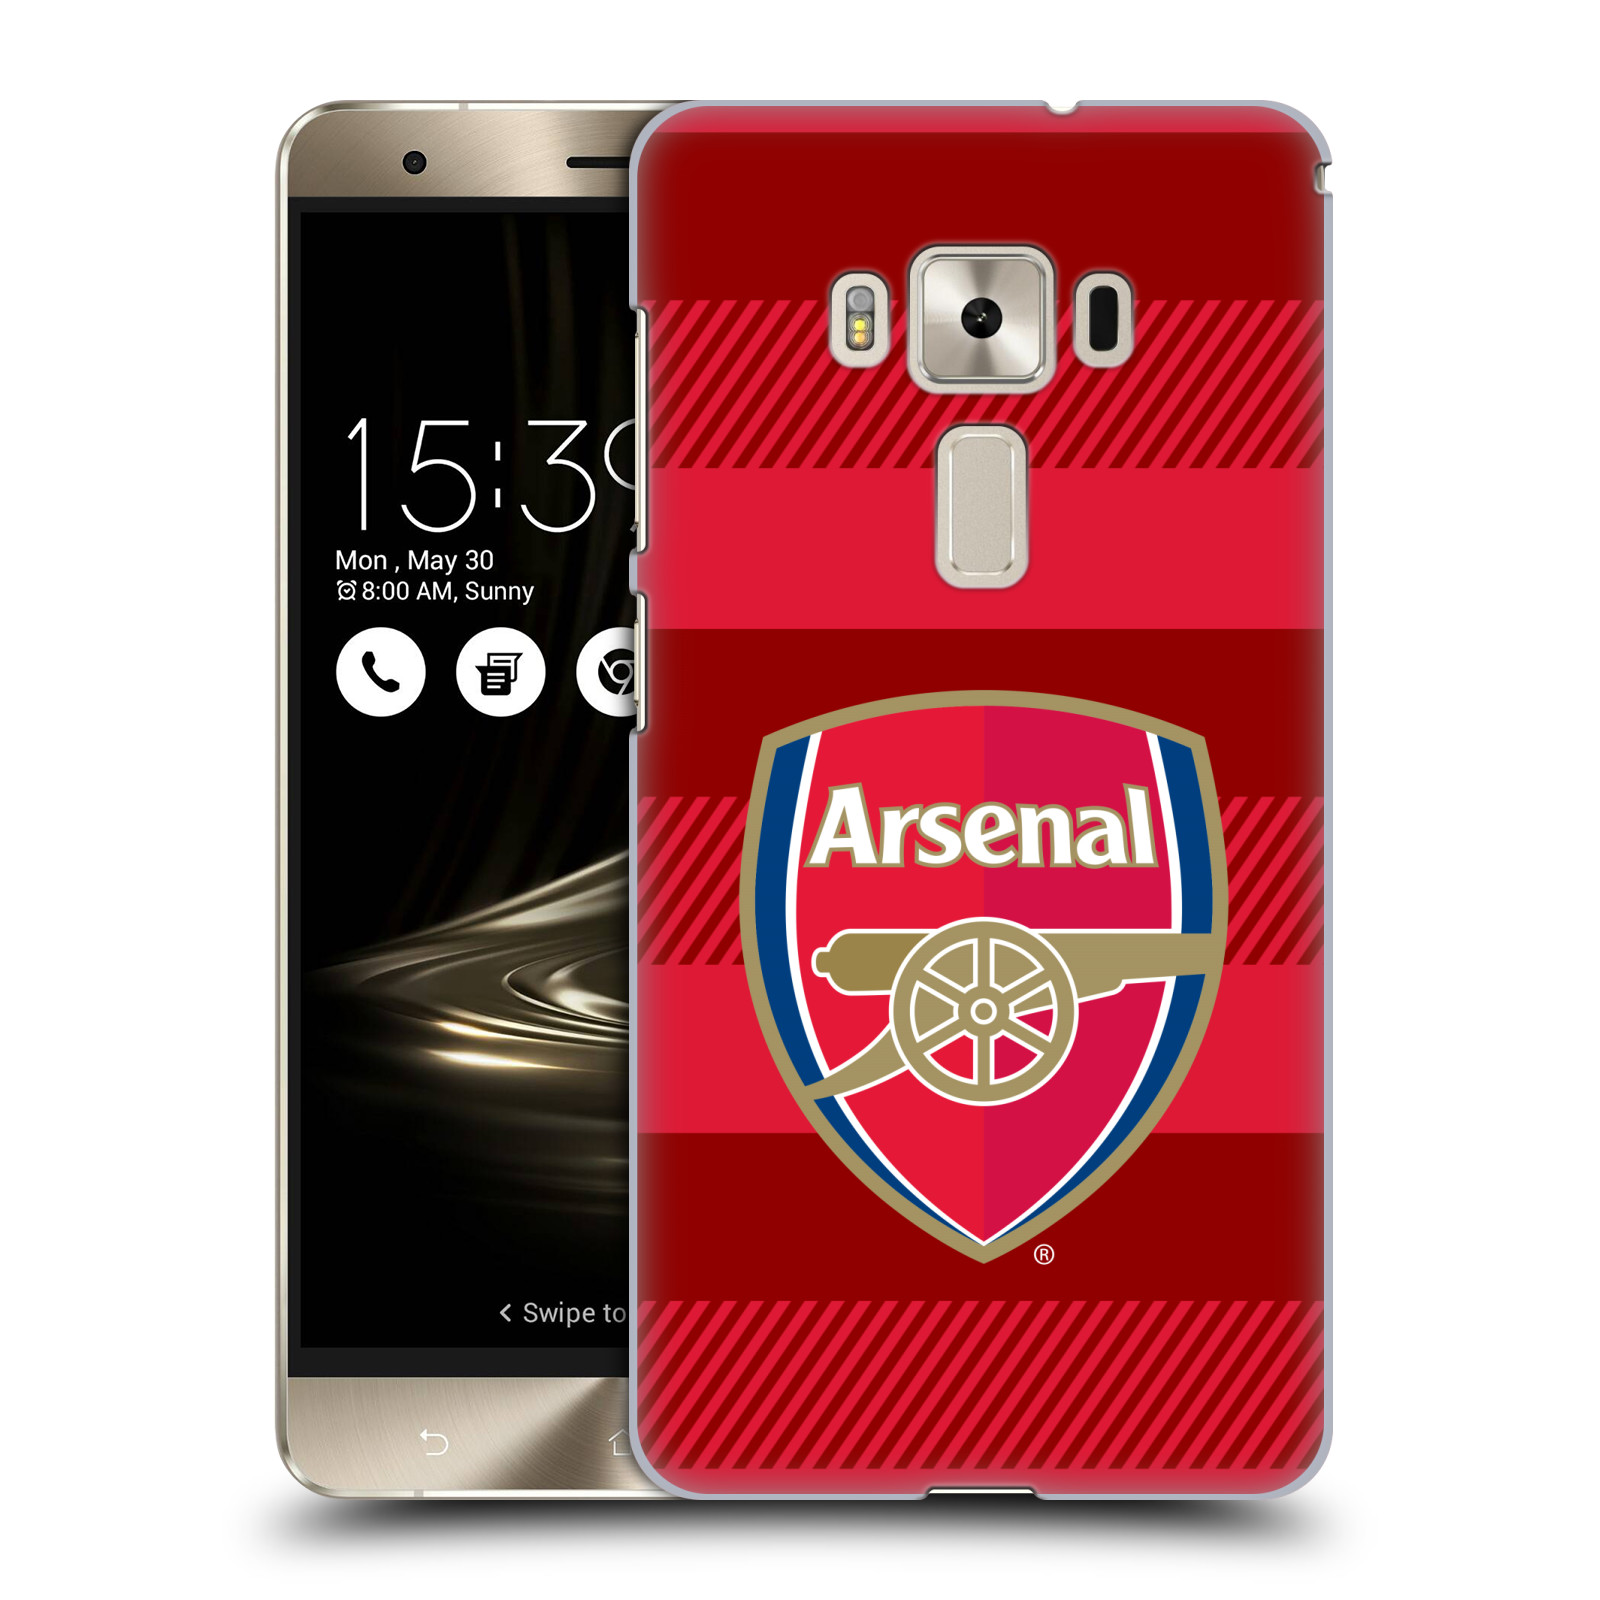 Plastové pouzdro na mobil Asus ZenFone 3 Deluxe ZS570KL - Head Case - Arsenal FC - Logo s pruhy